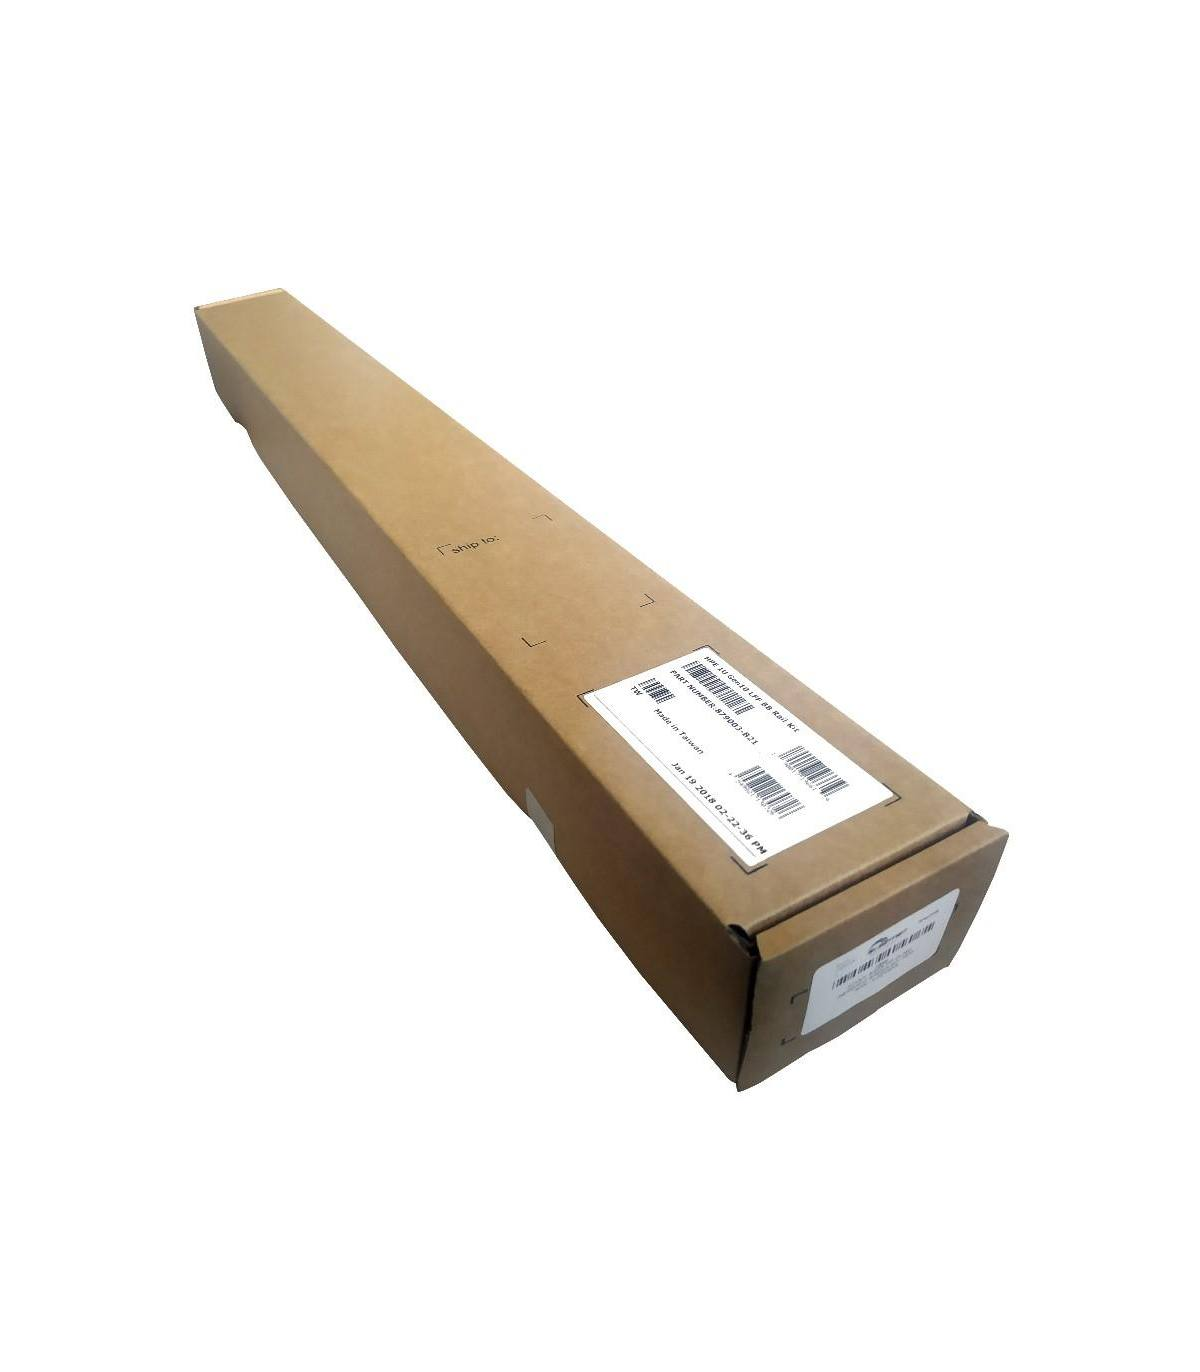 SZYNY RACK HP DL360 G8 G9 G10 879003-B21 NEW BOX